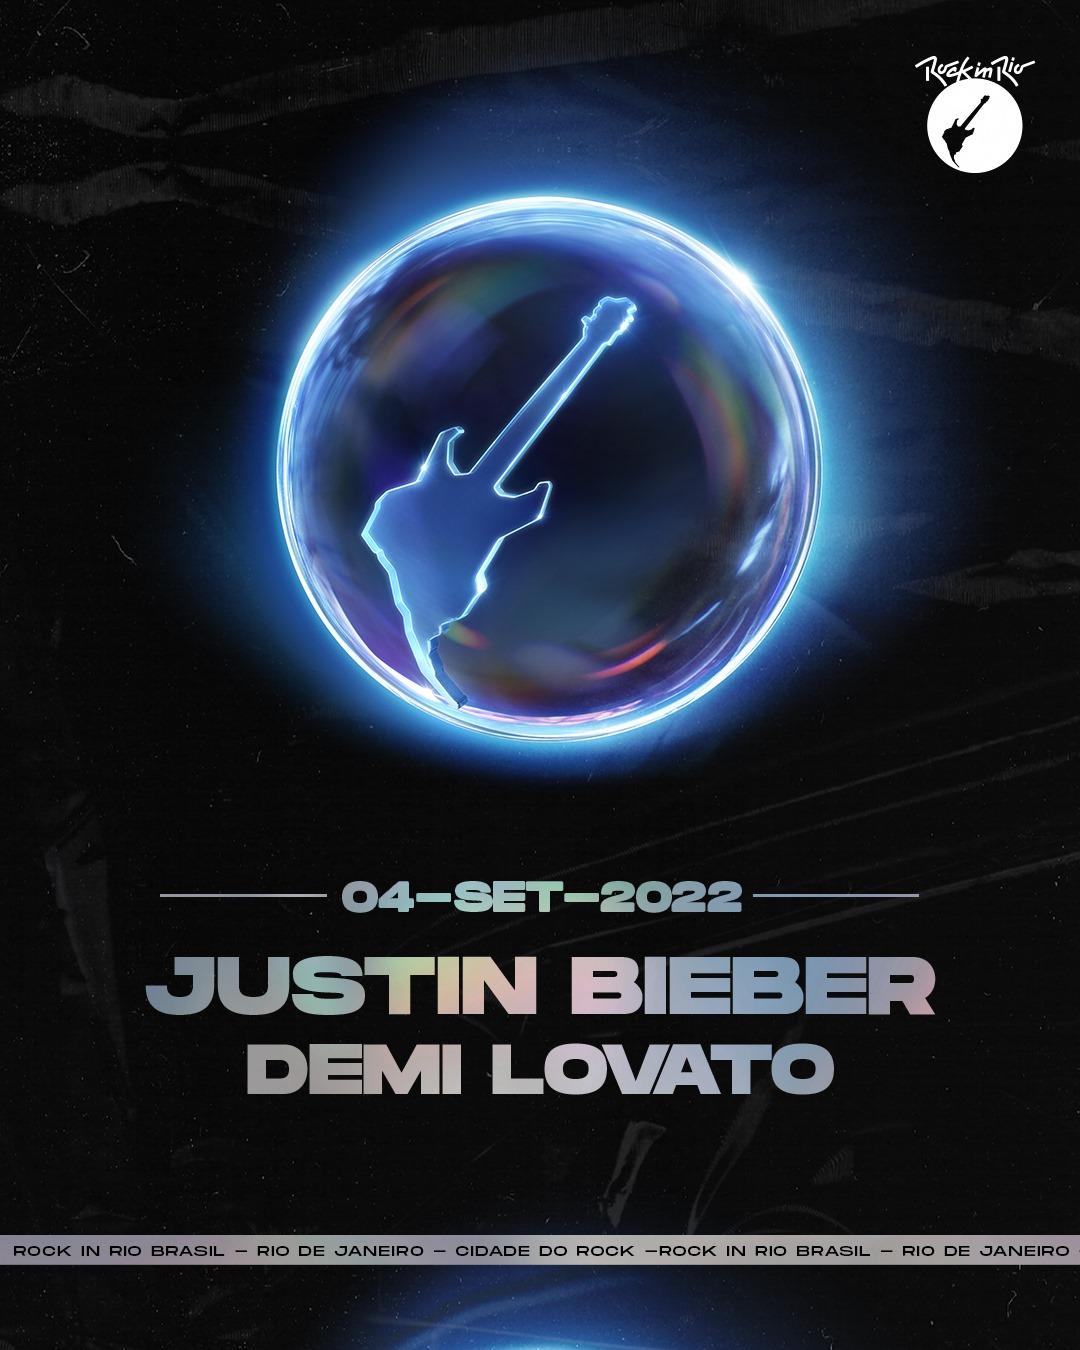 Justin Bieber & Demi Lovato Announced For Rock in Rio Brasil 2022 ...